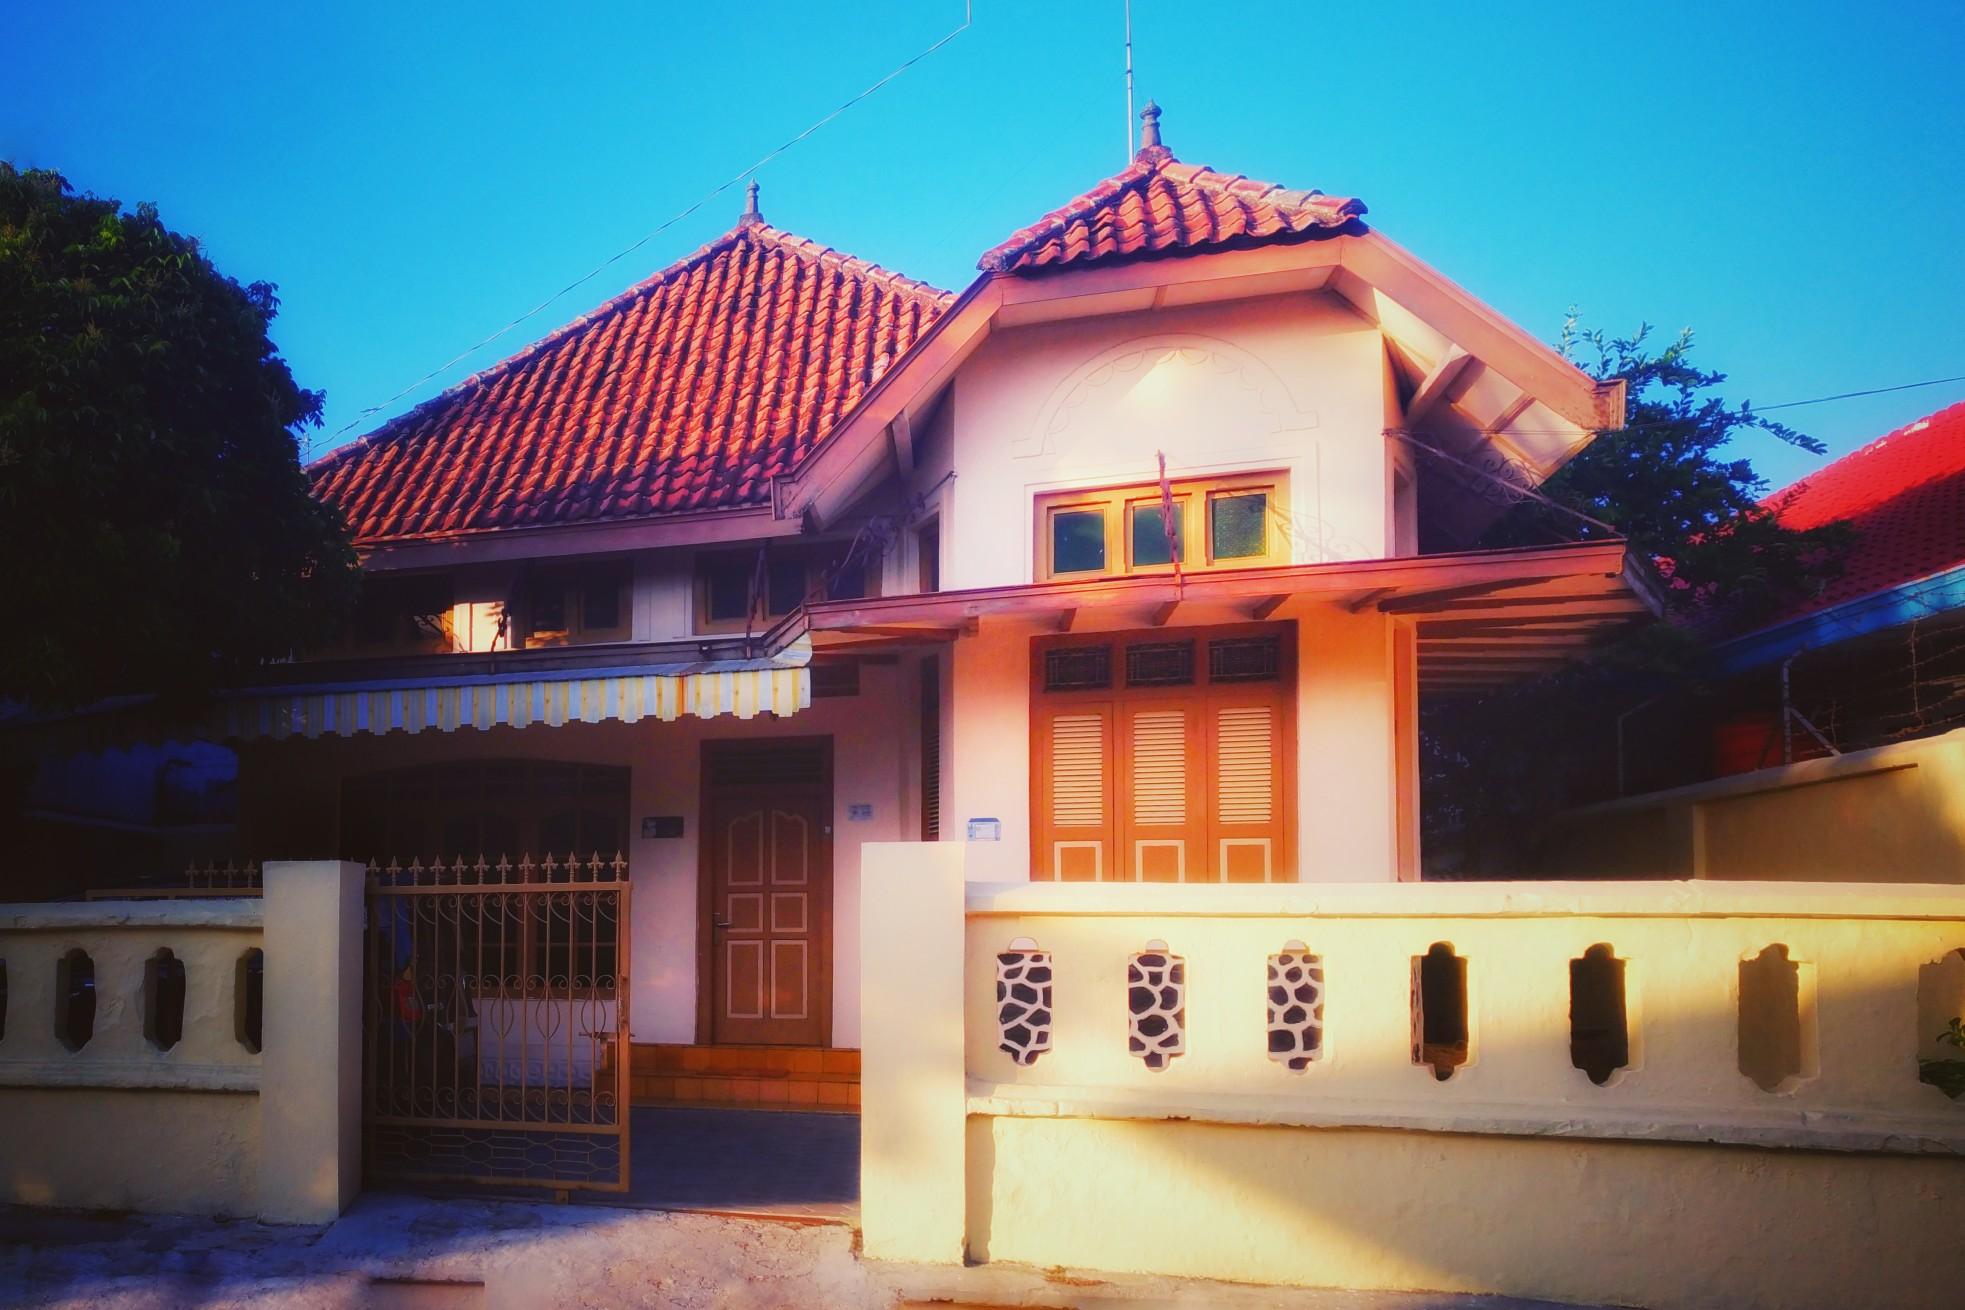 Bosscha Observatory Lembang Bandung Http En Wikipedia Org Wiki Foto